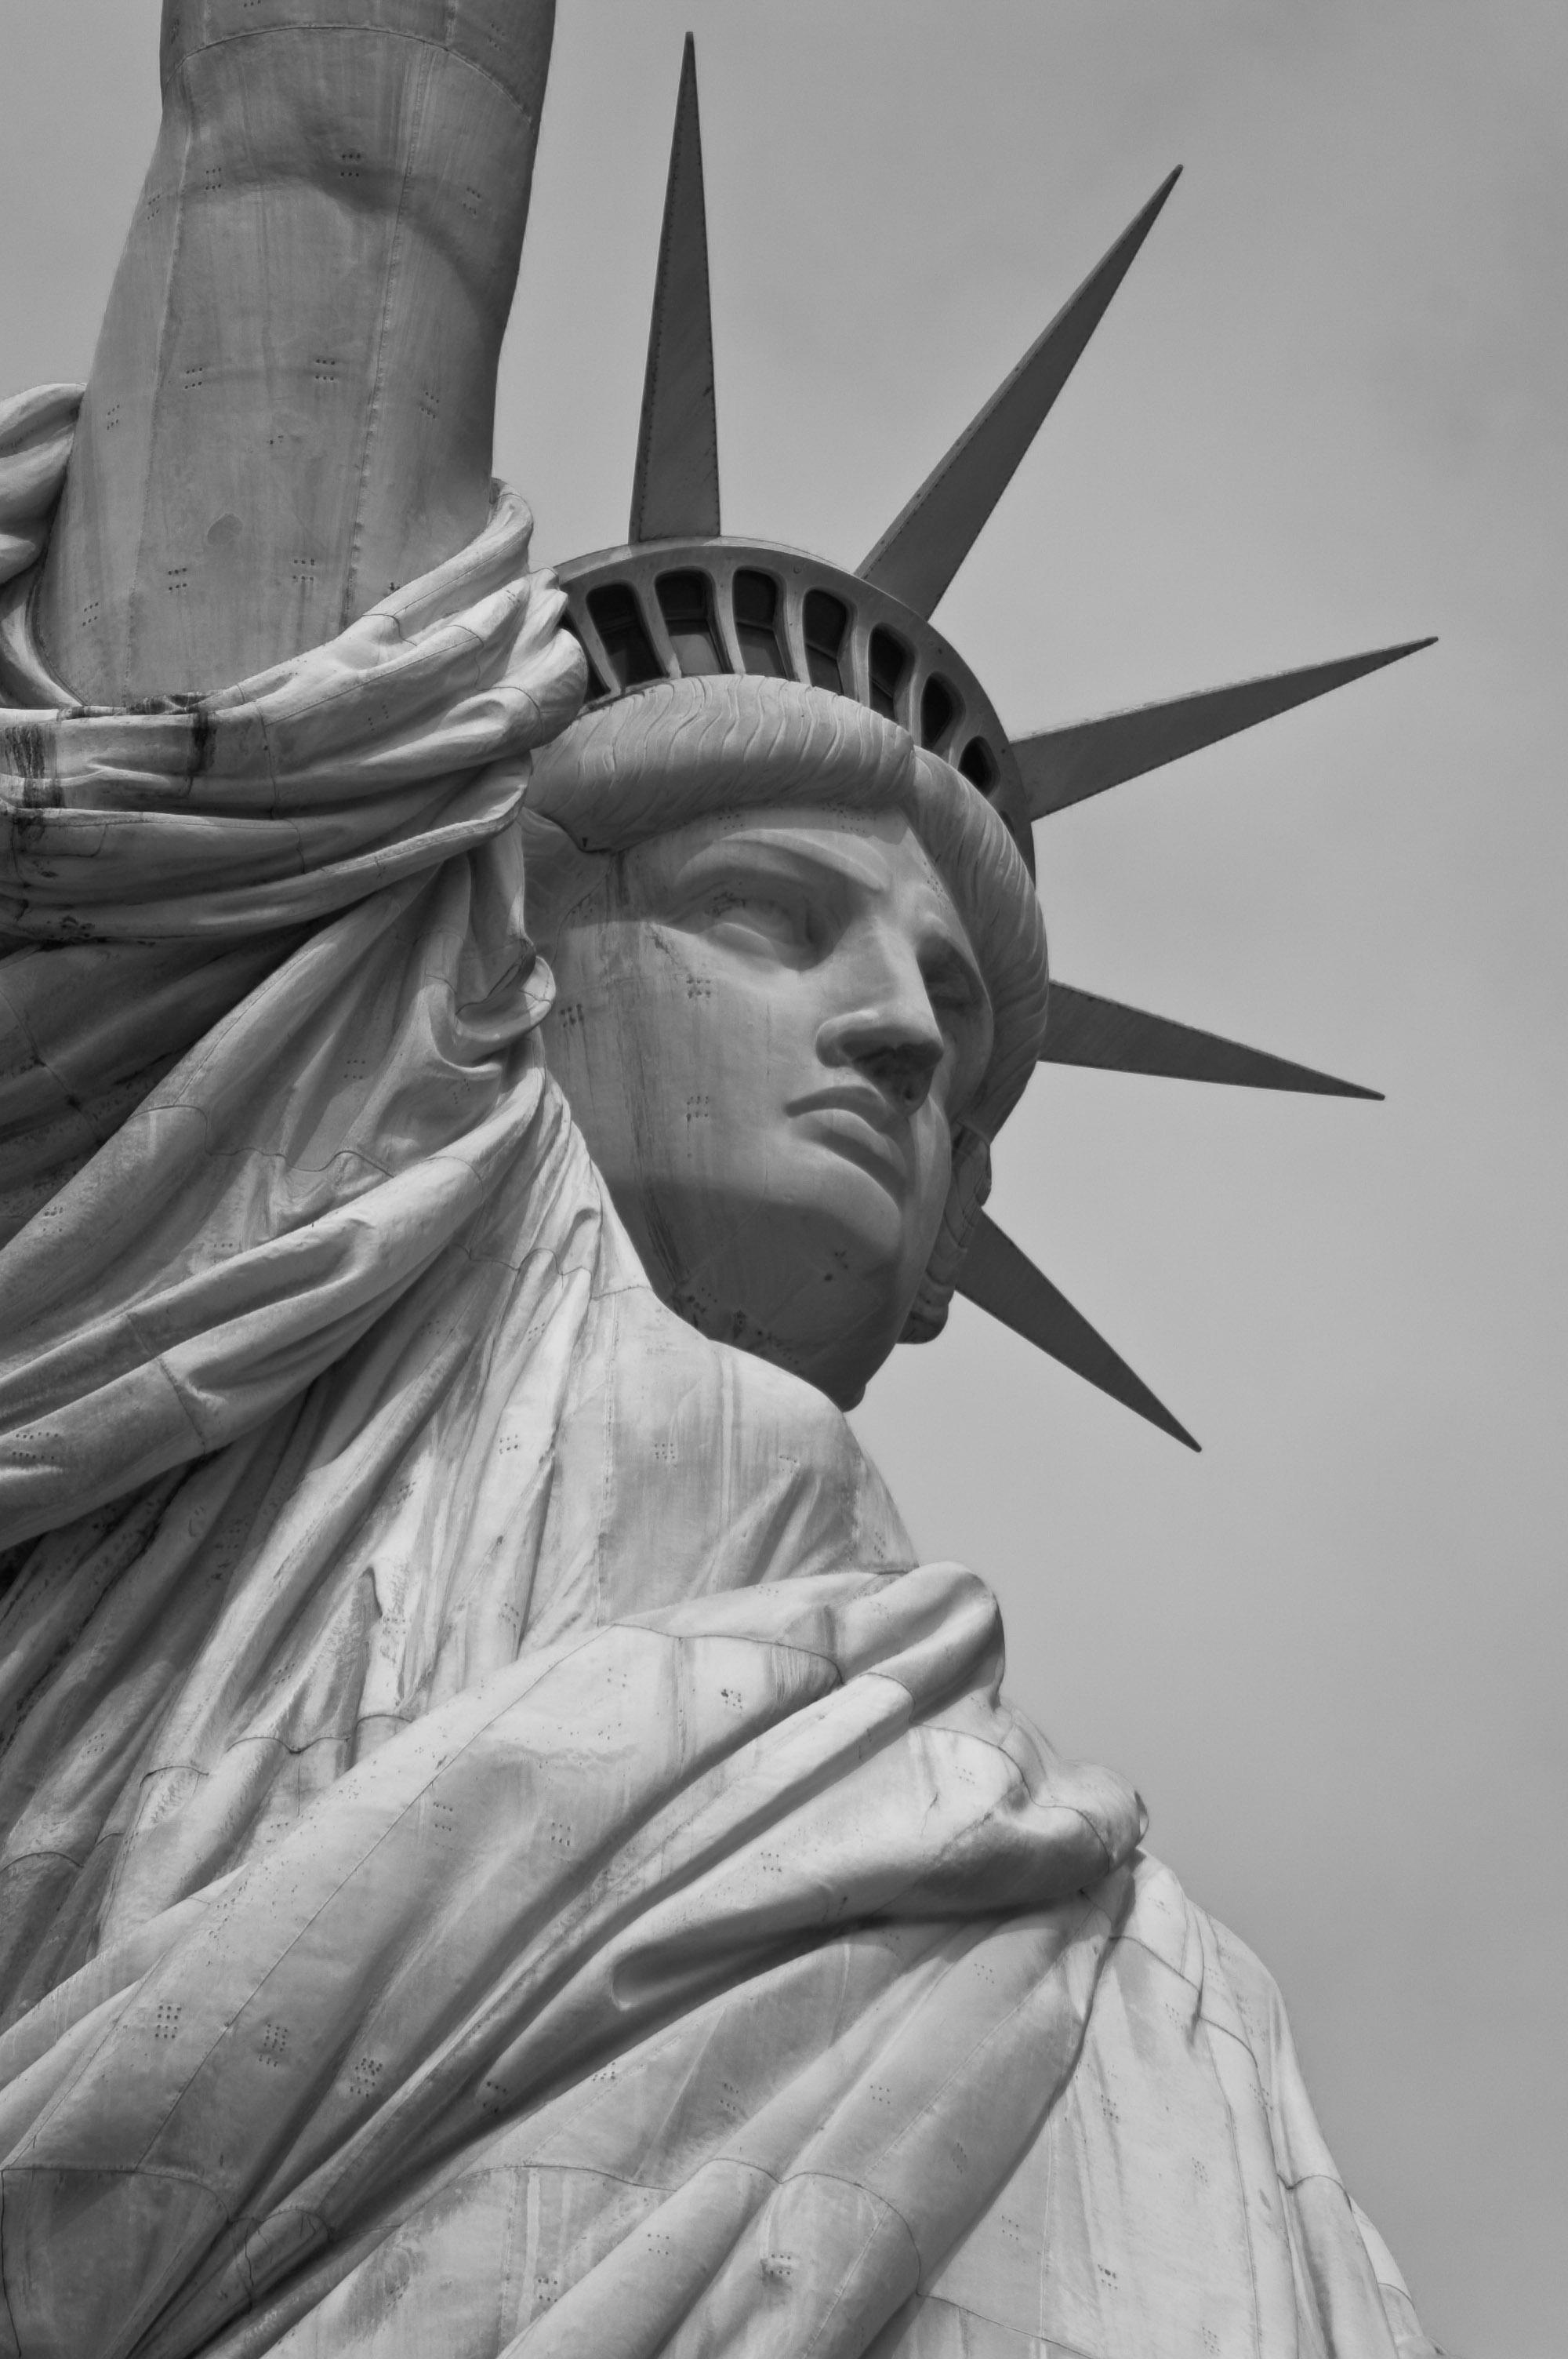 10 Reasons I Love the USA (Happy 4th of July)